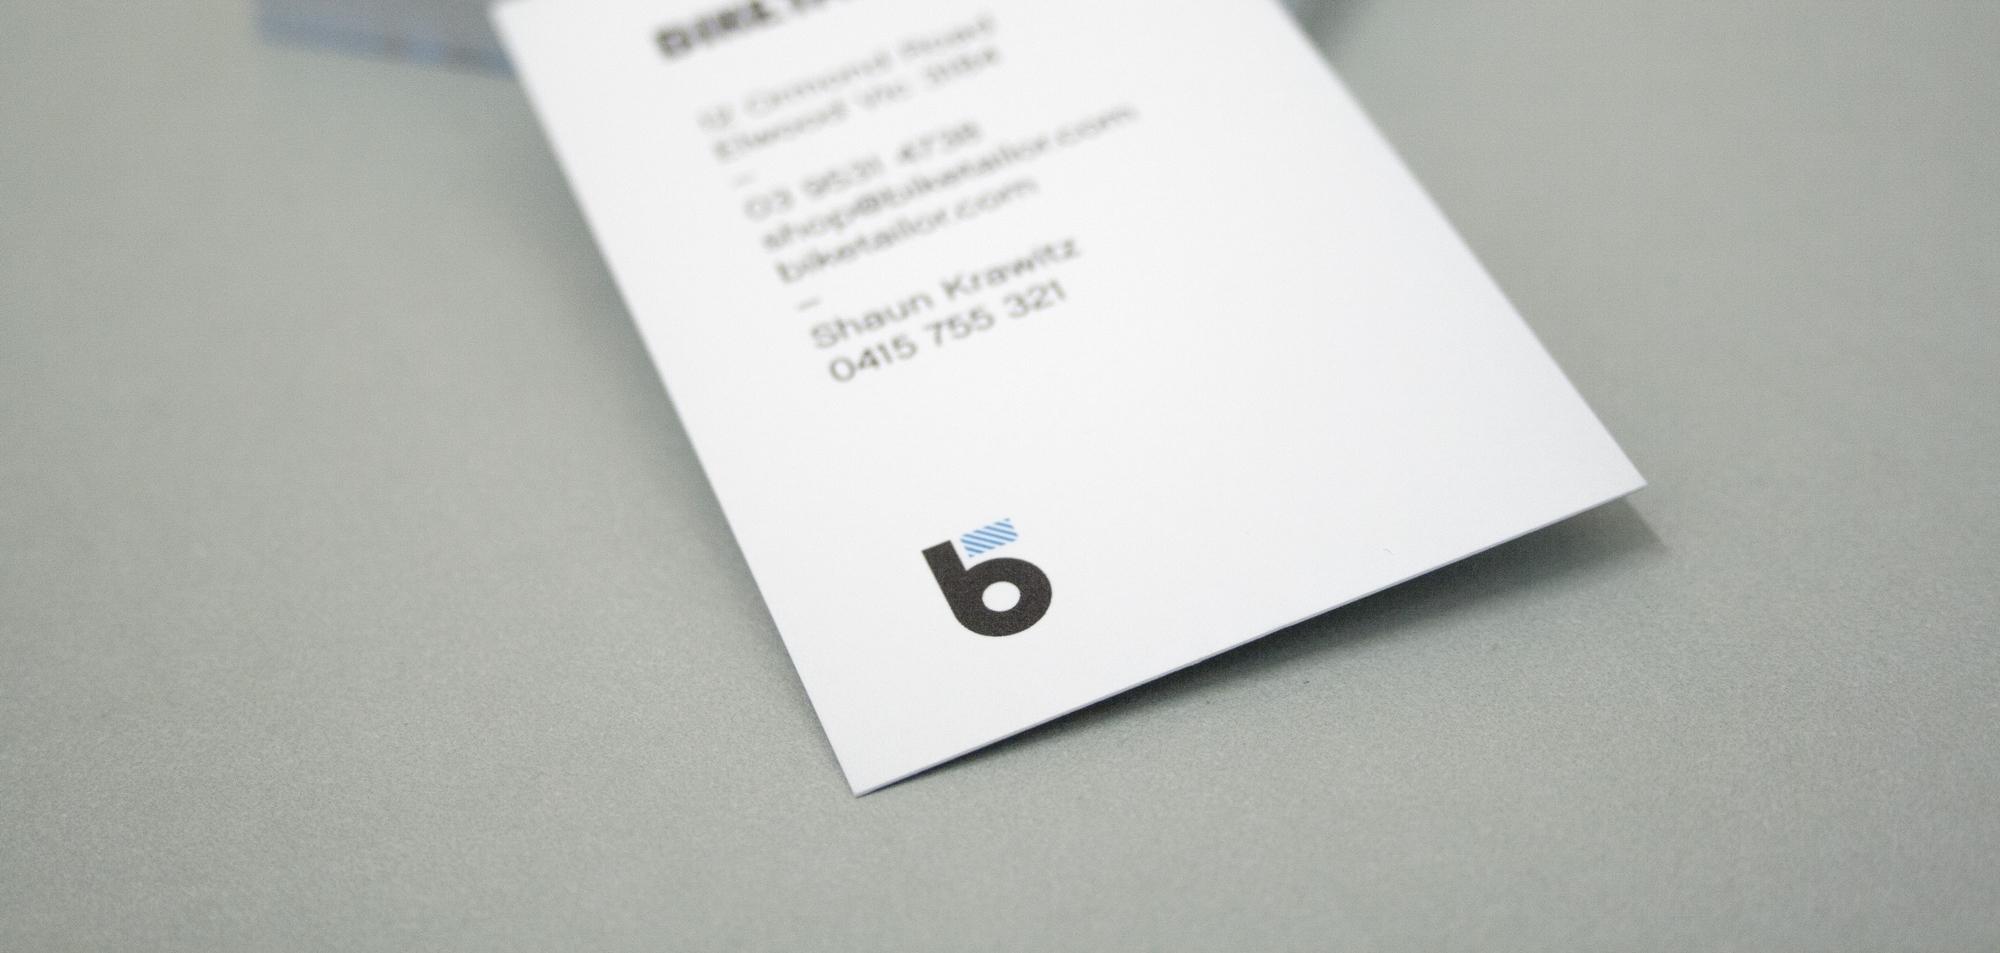 Bike Tailor business card close up